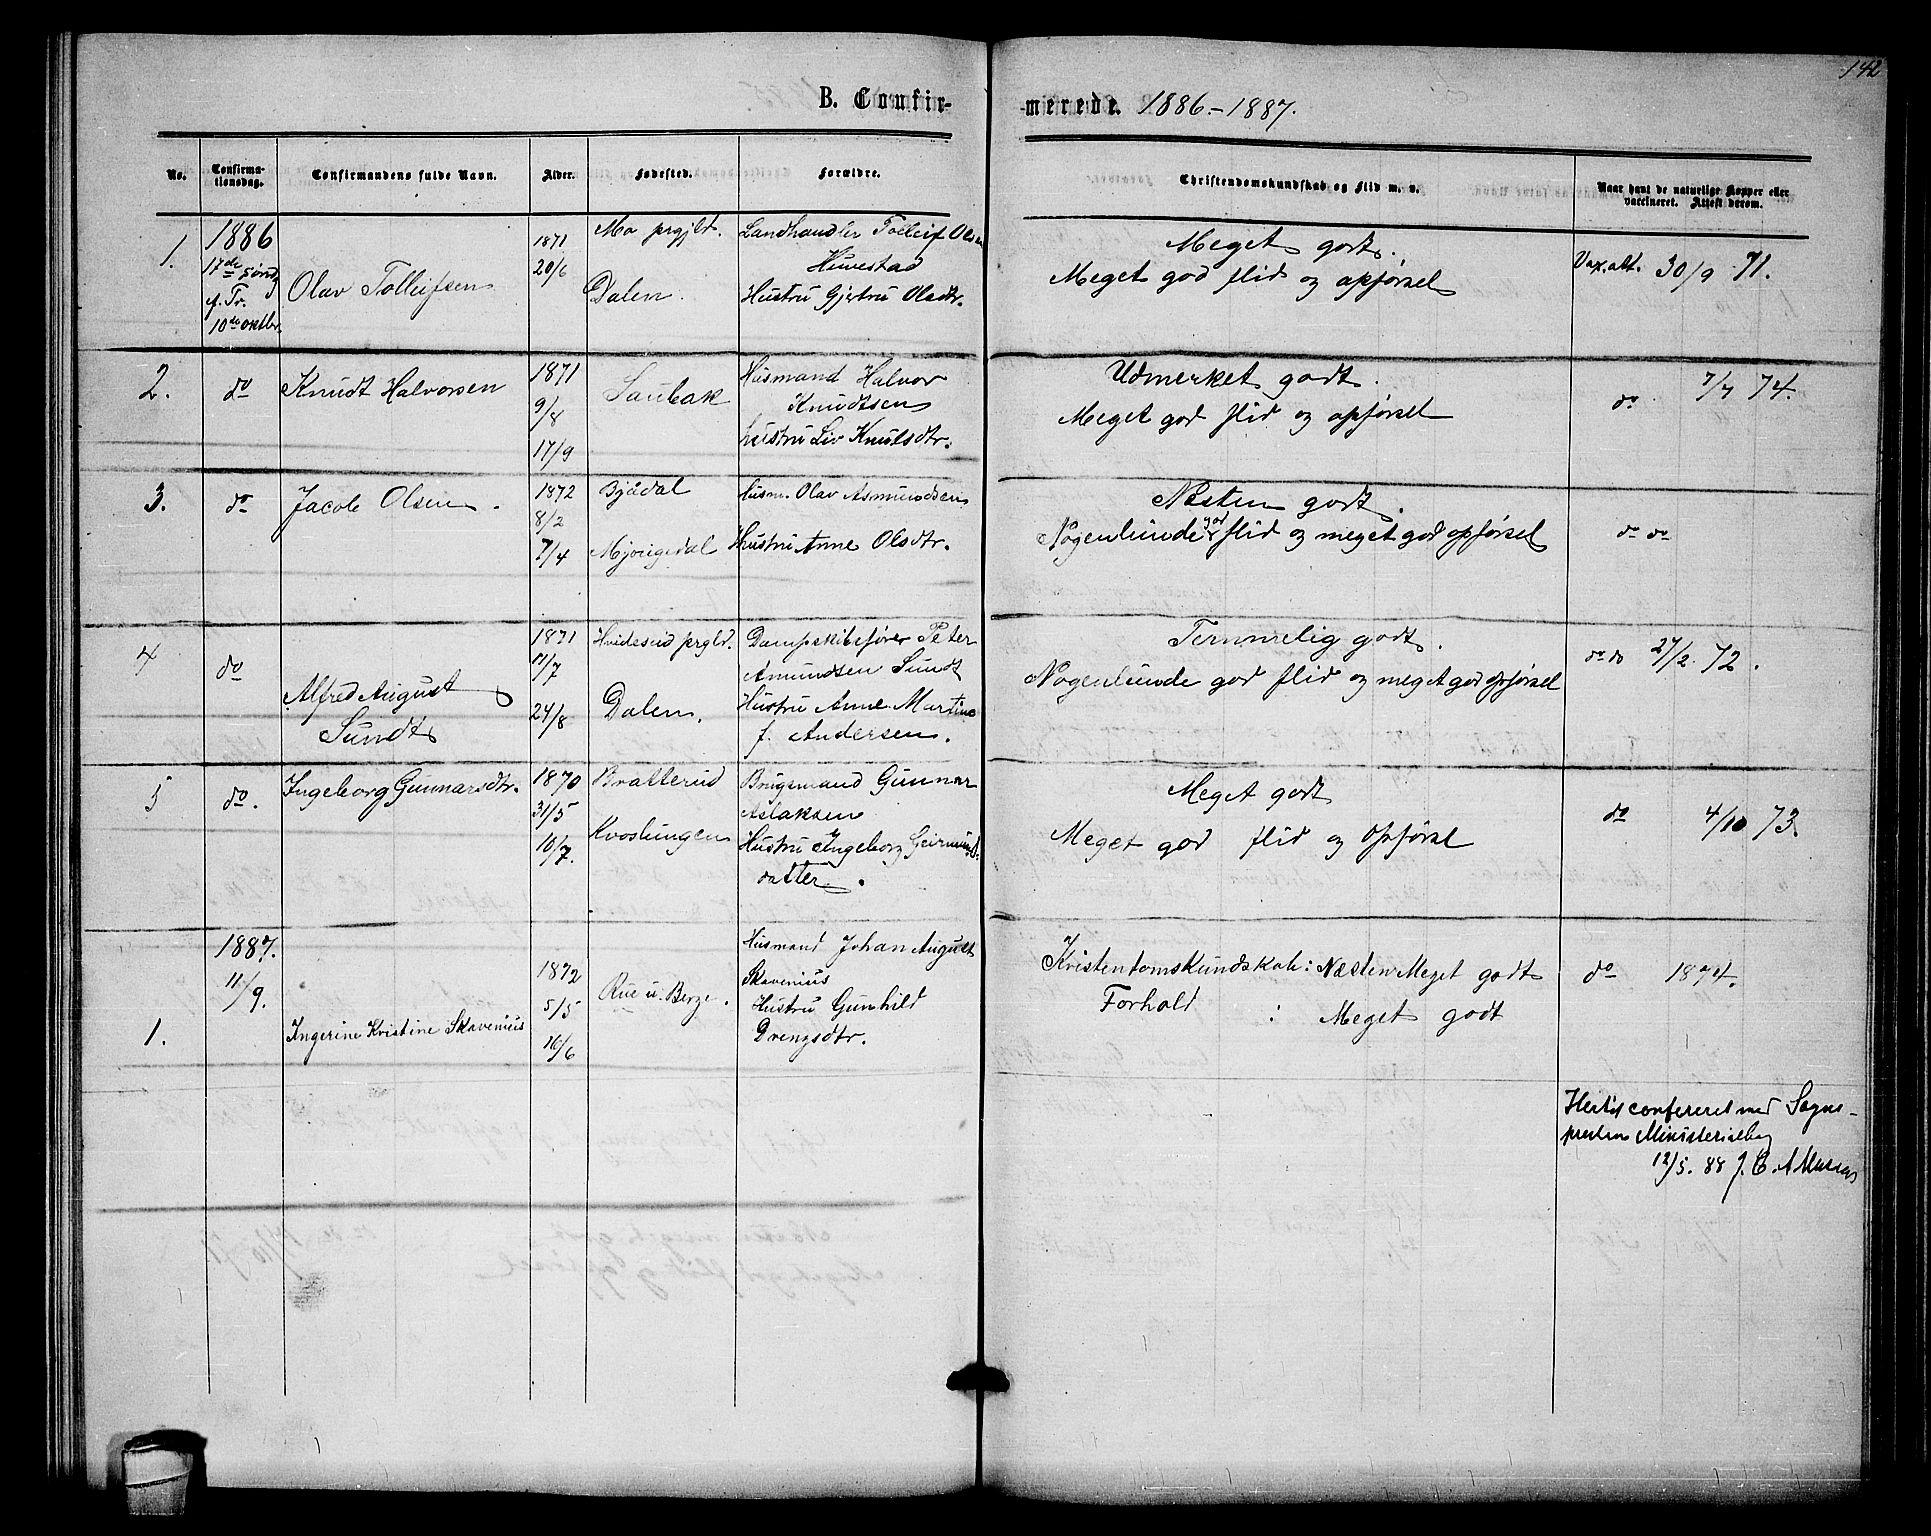 SAKO, Lårdal kirkebøker, G/Gb/L0002: Klokkerbok nr. II 2, 1865-1888, s. 142